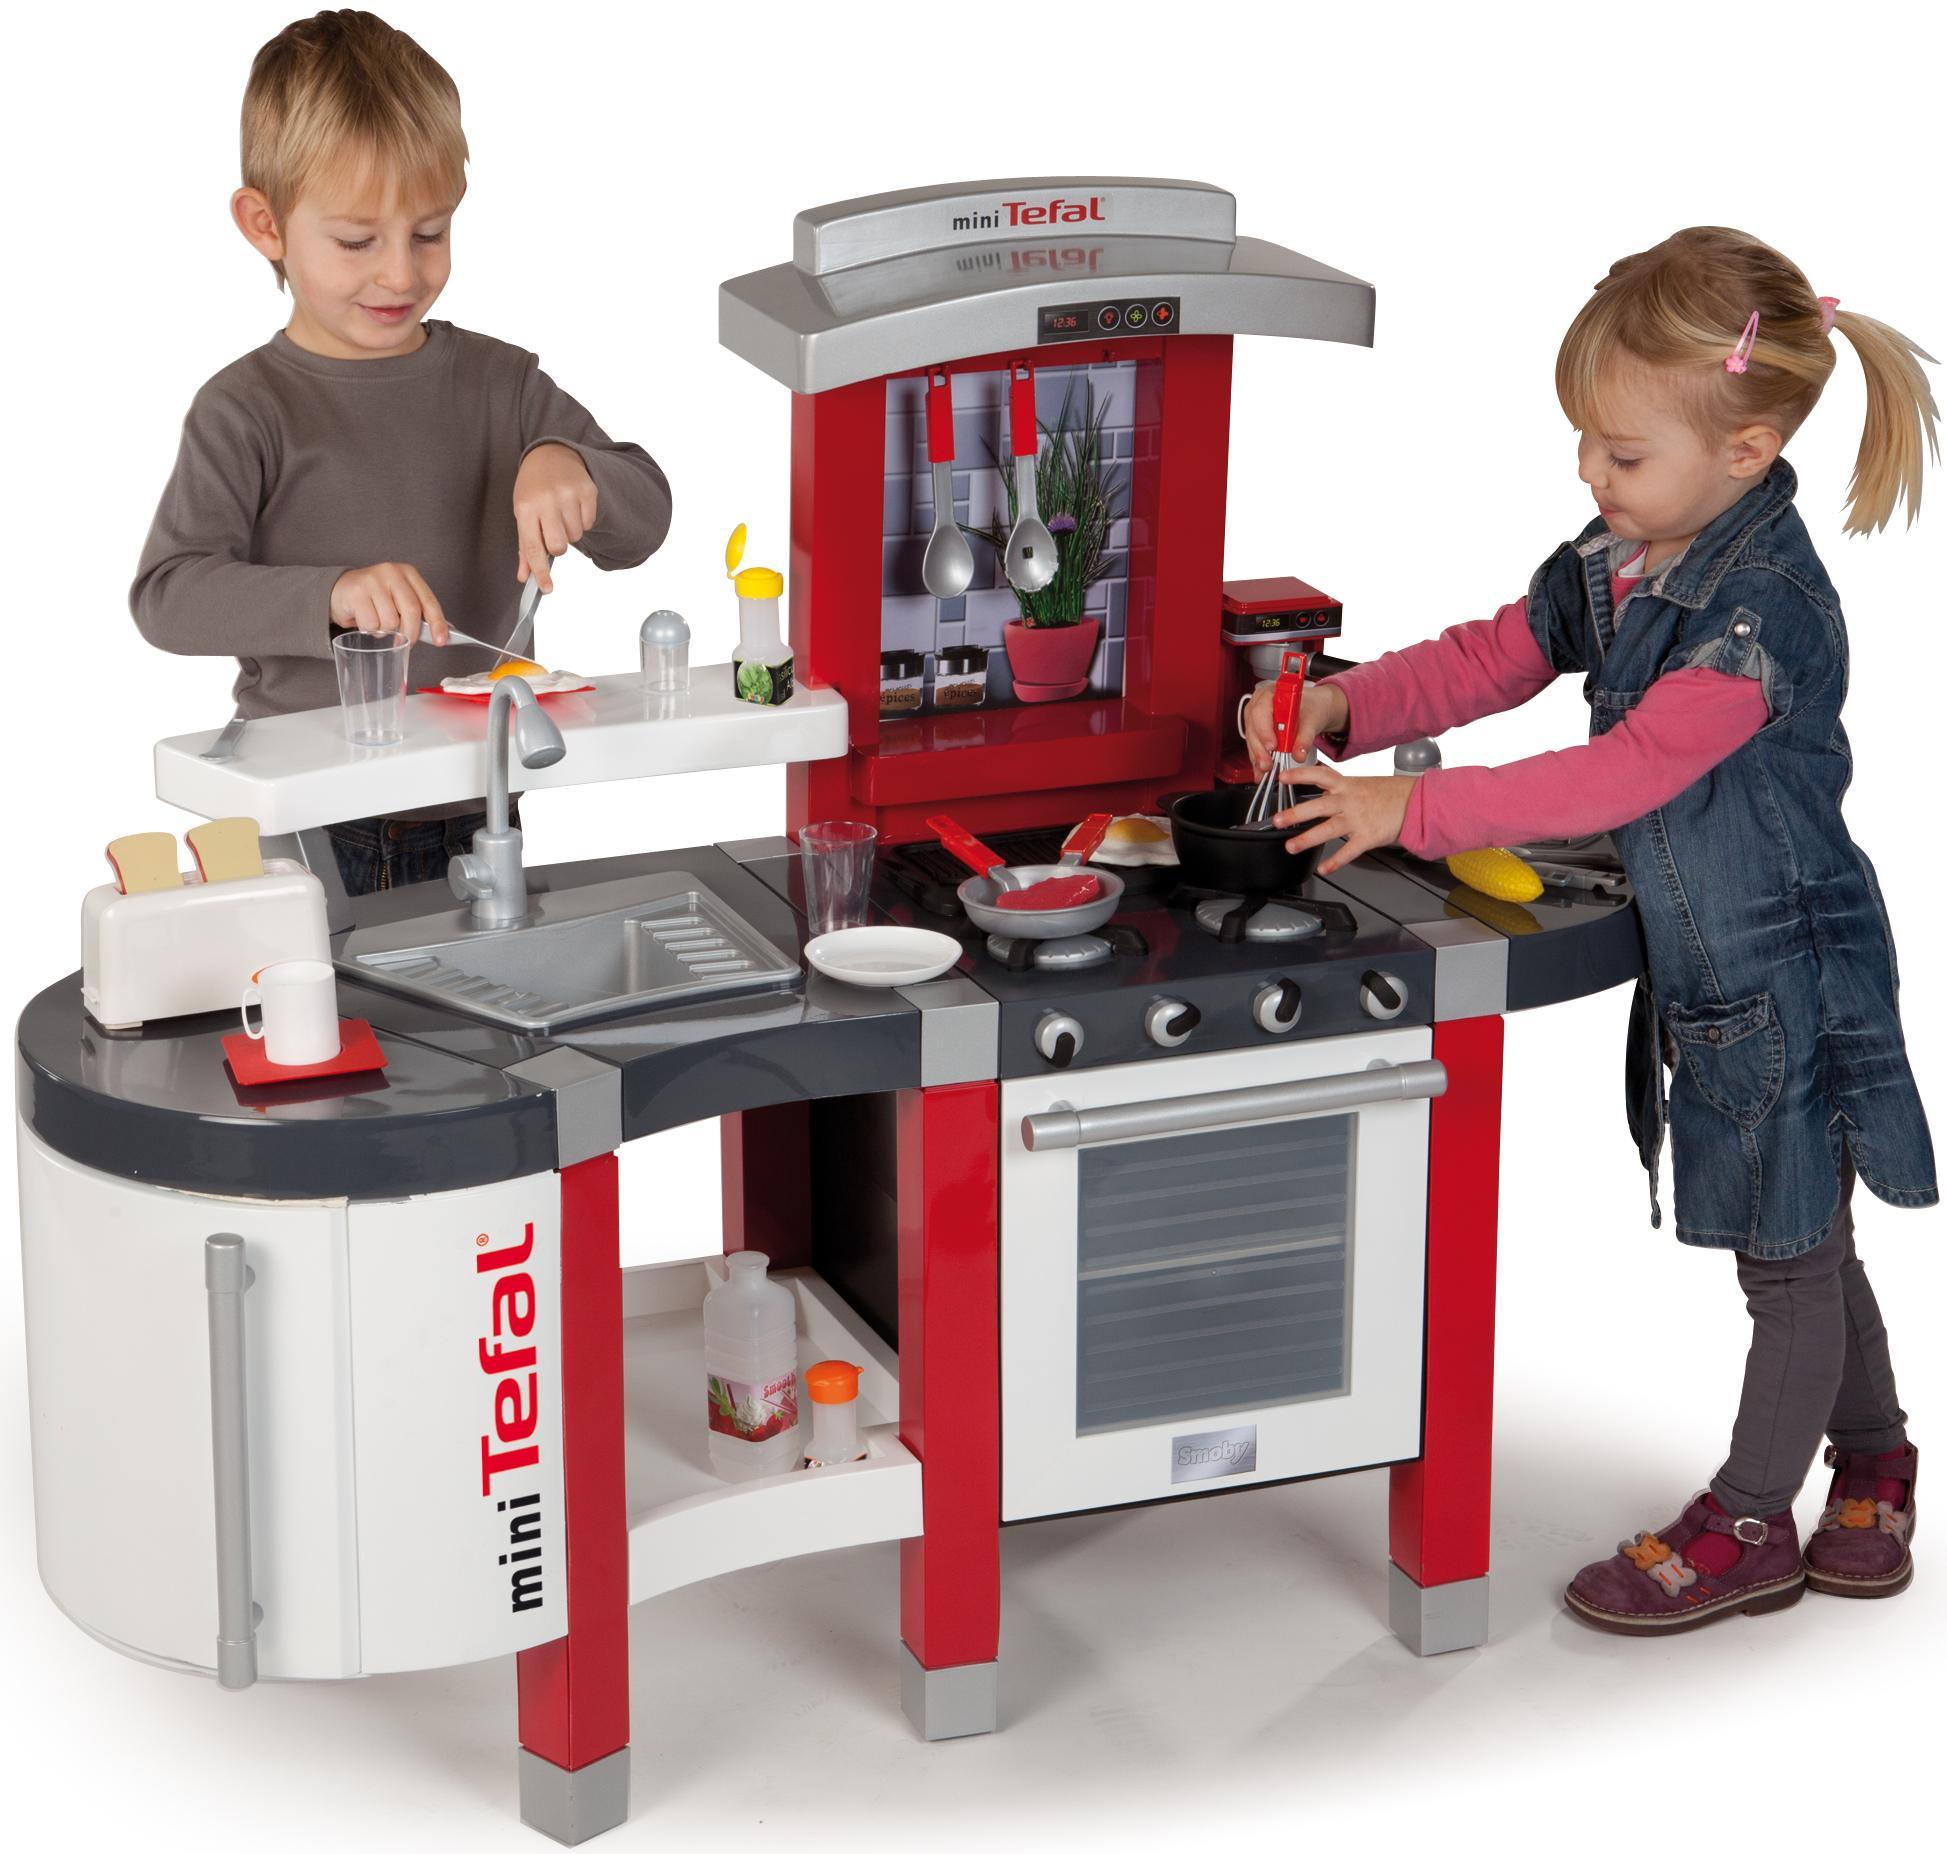 Tefal Mini Küche Smoby Tefal Chef Kinderküche Günstig Kaufen Mifus De